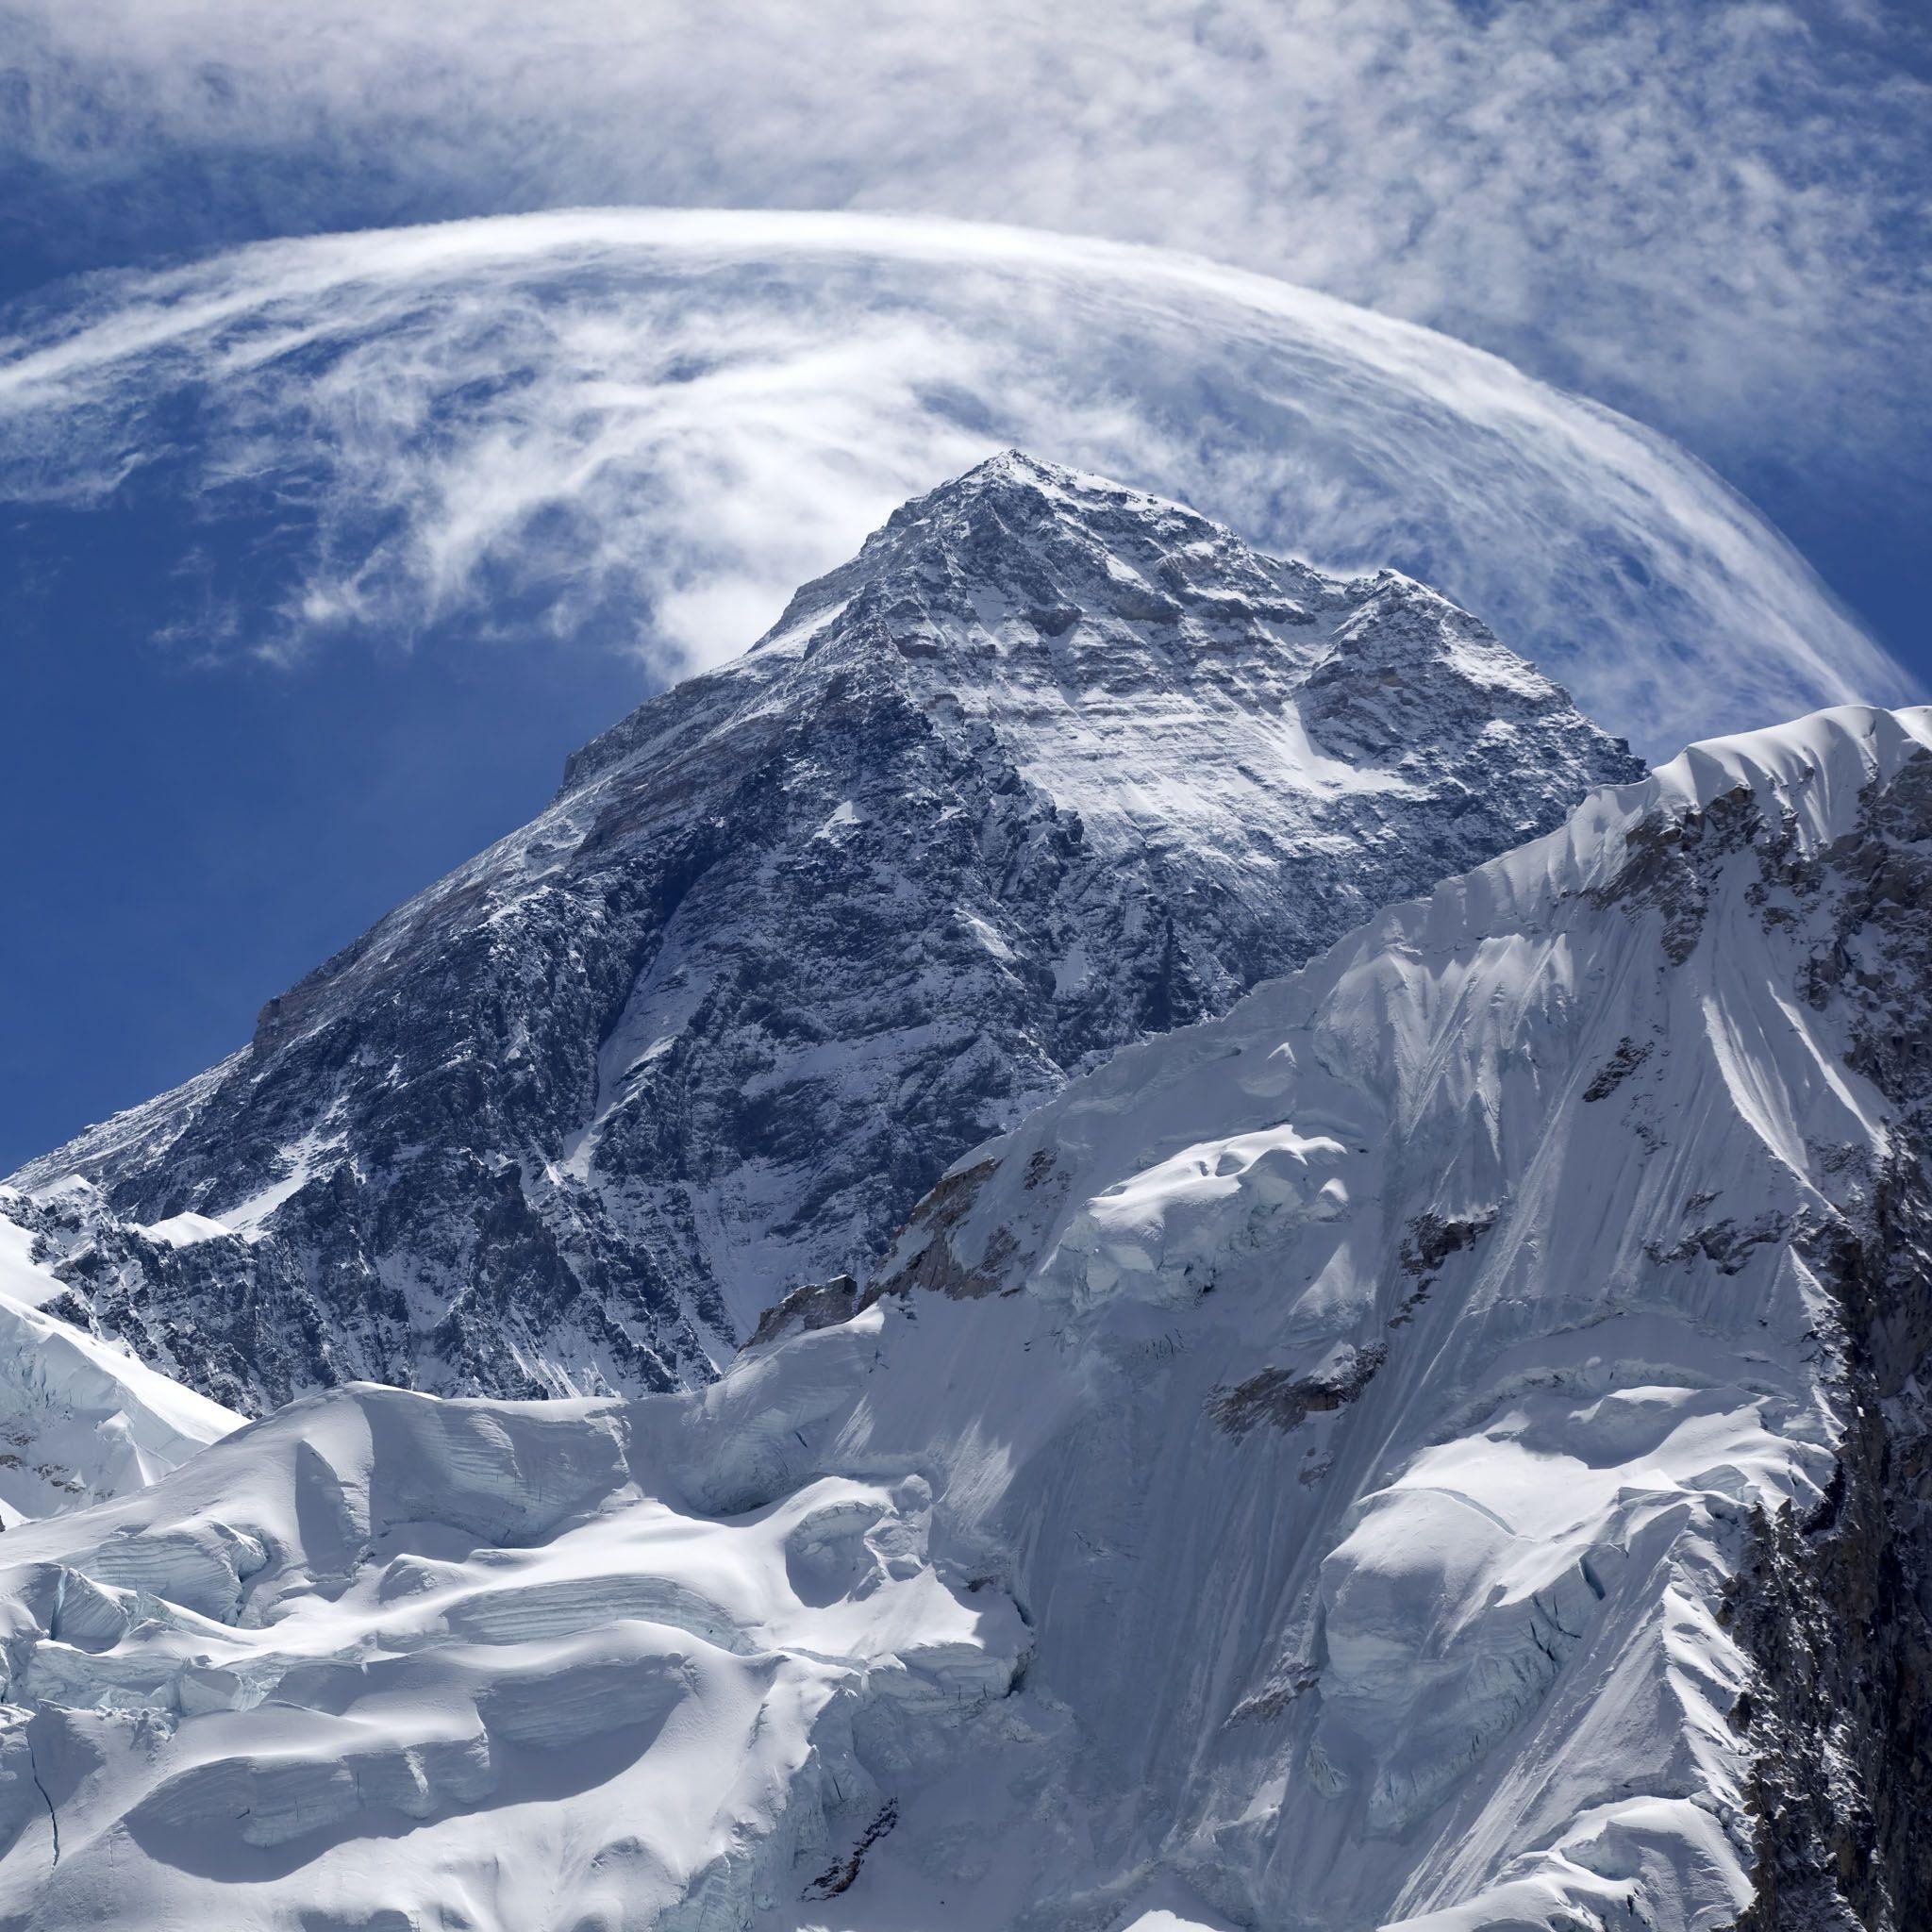 Mount Hd Wallpaper: Everest Wallpapers